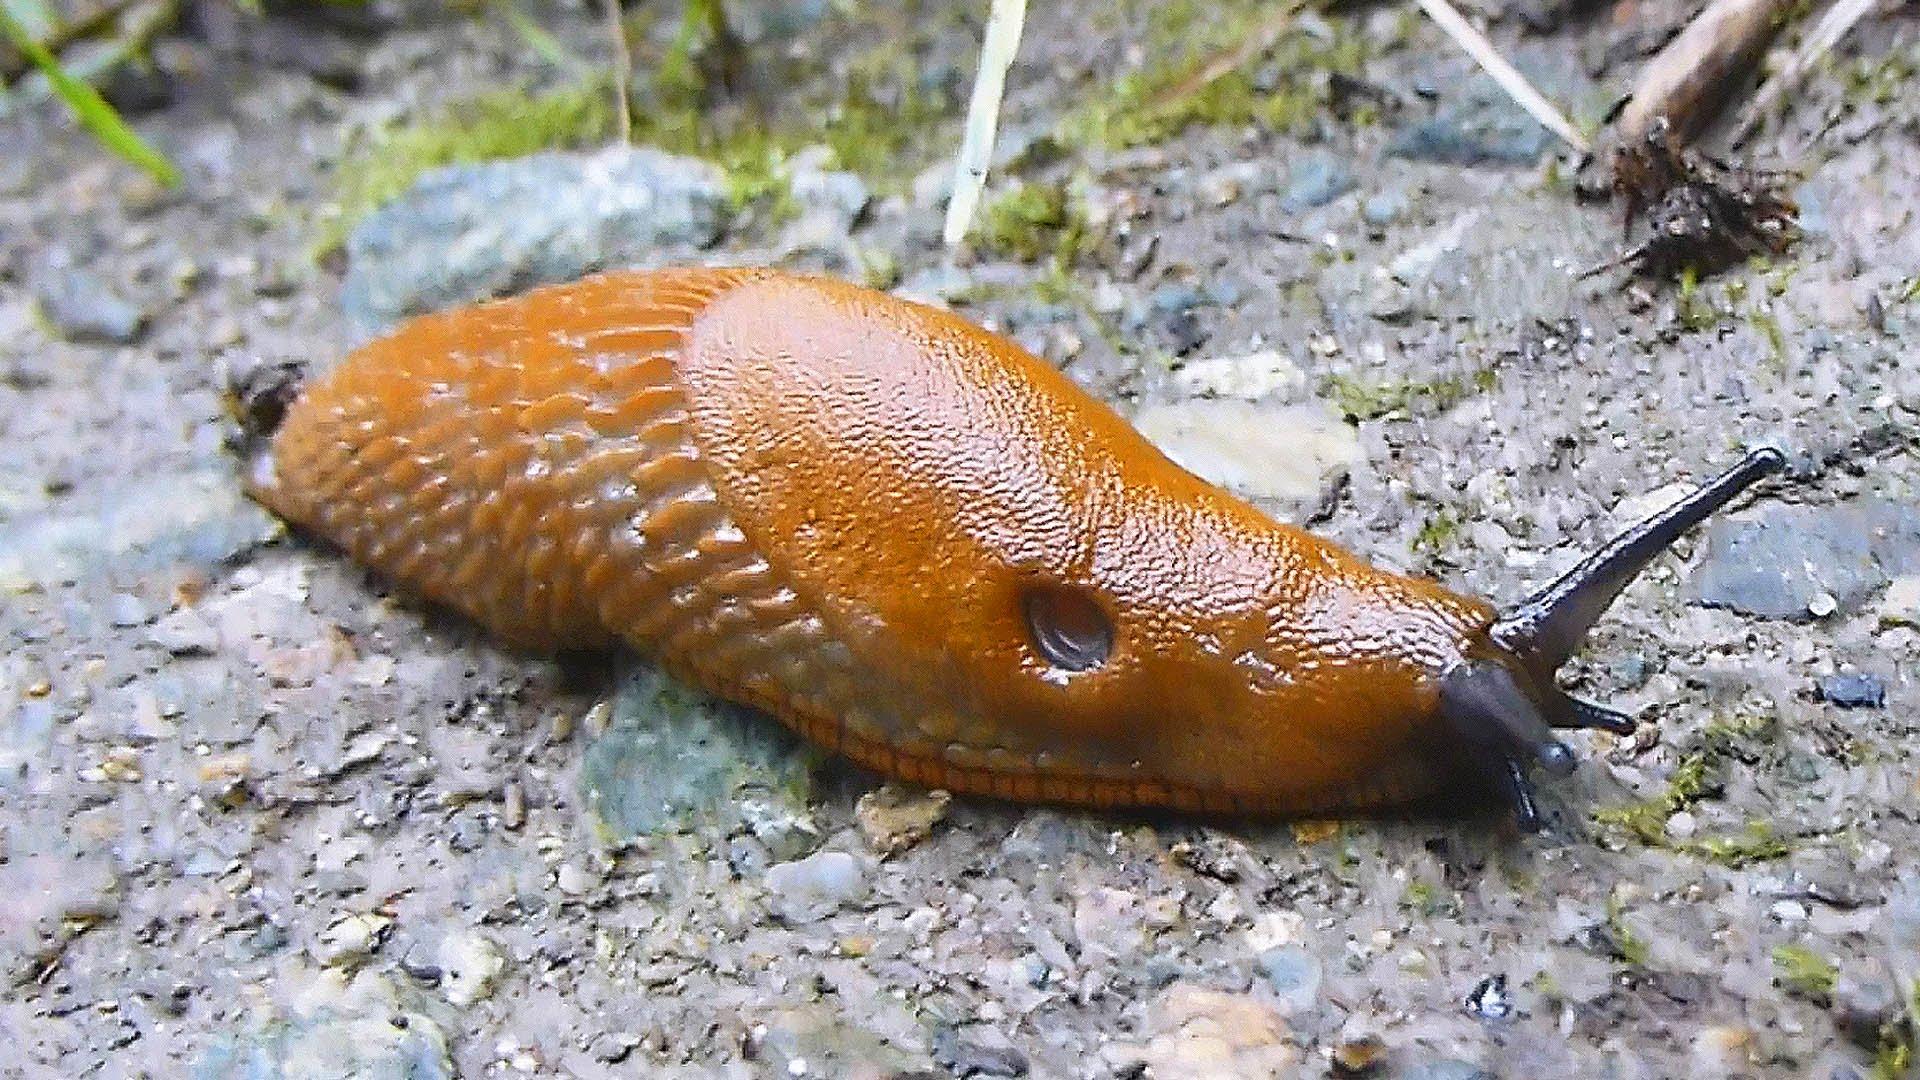 Spanish slug photo